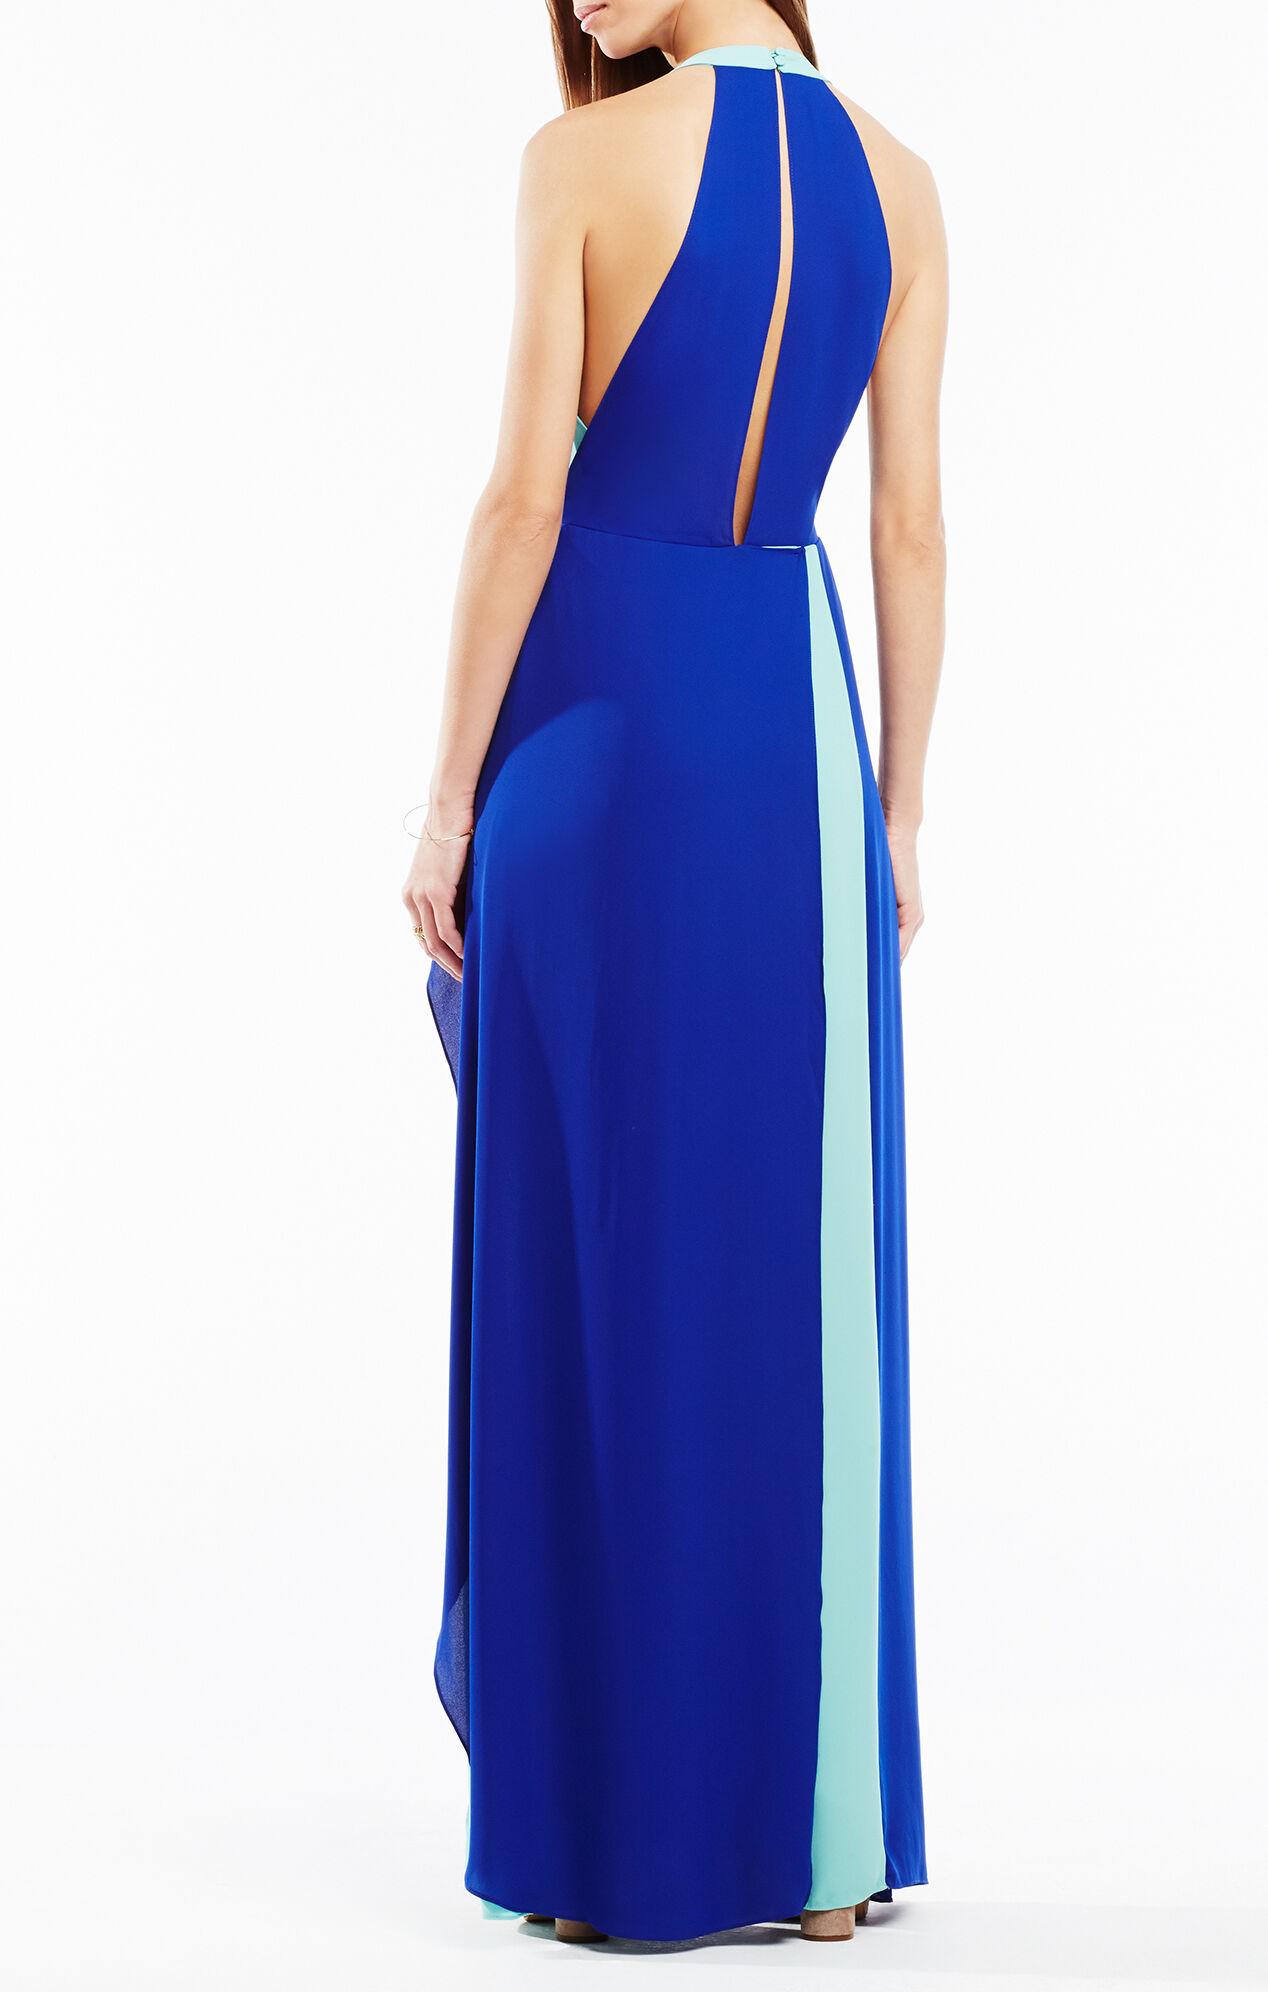 Camillia Halter-Neck Color-Blocked Dress